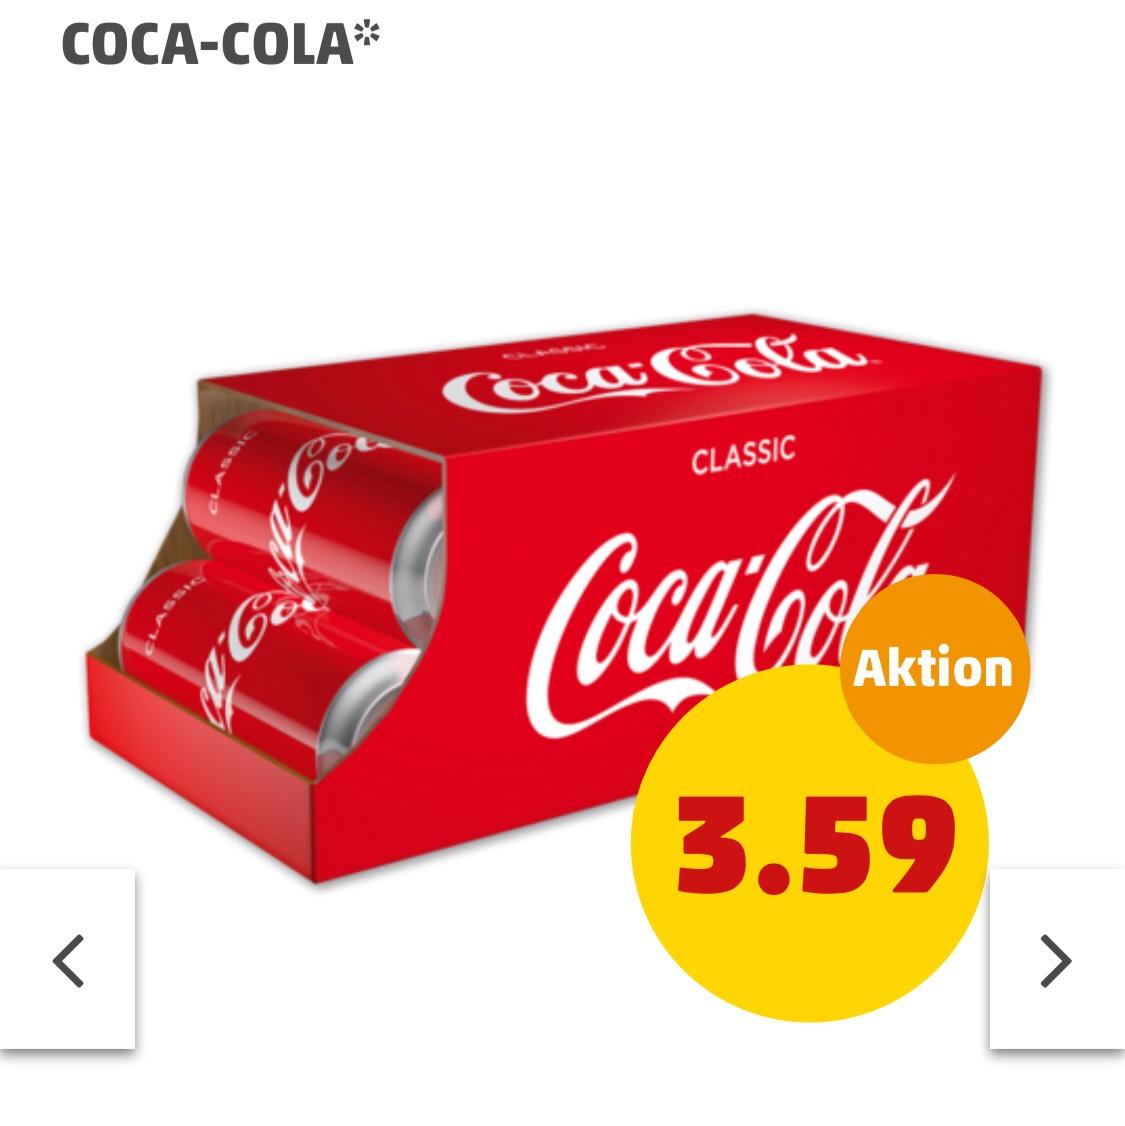 [Penny] Coca Cola 10x0,33 Dose für 3,59 + 2,50 Pfand - Literpreis 1.09